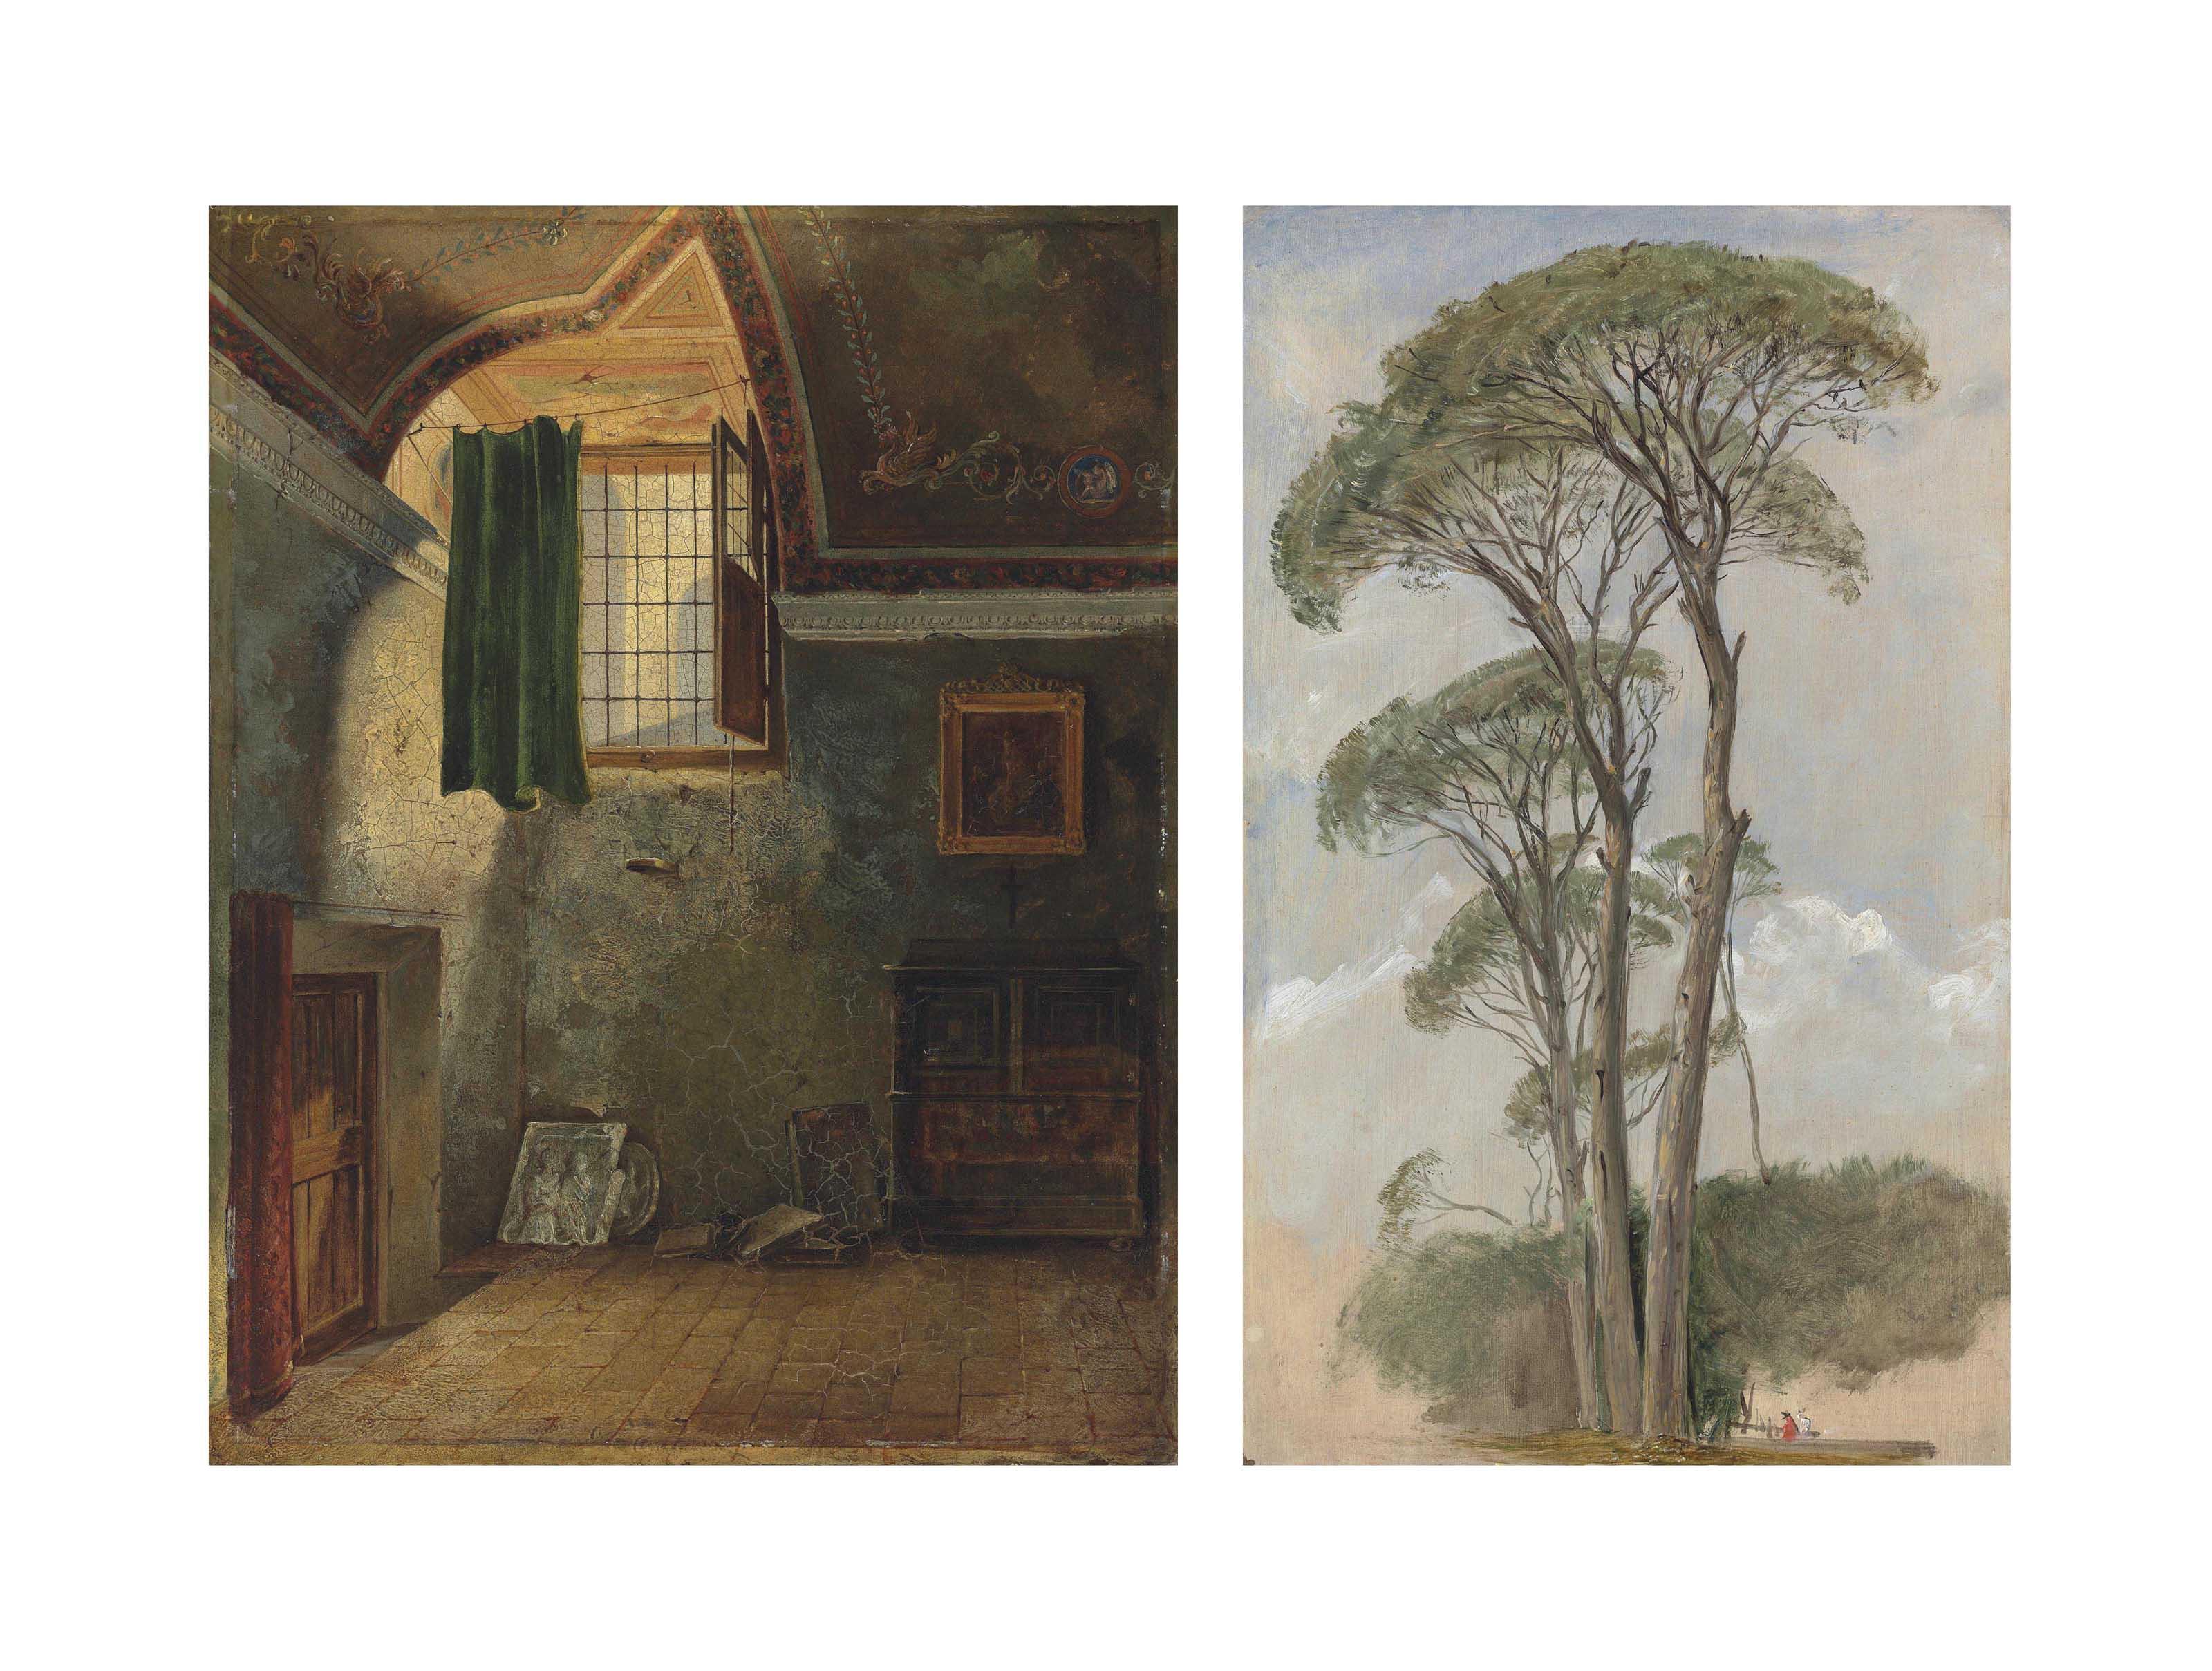 Michelangelo's Study, Rome